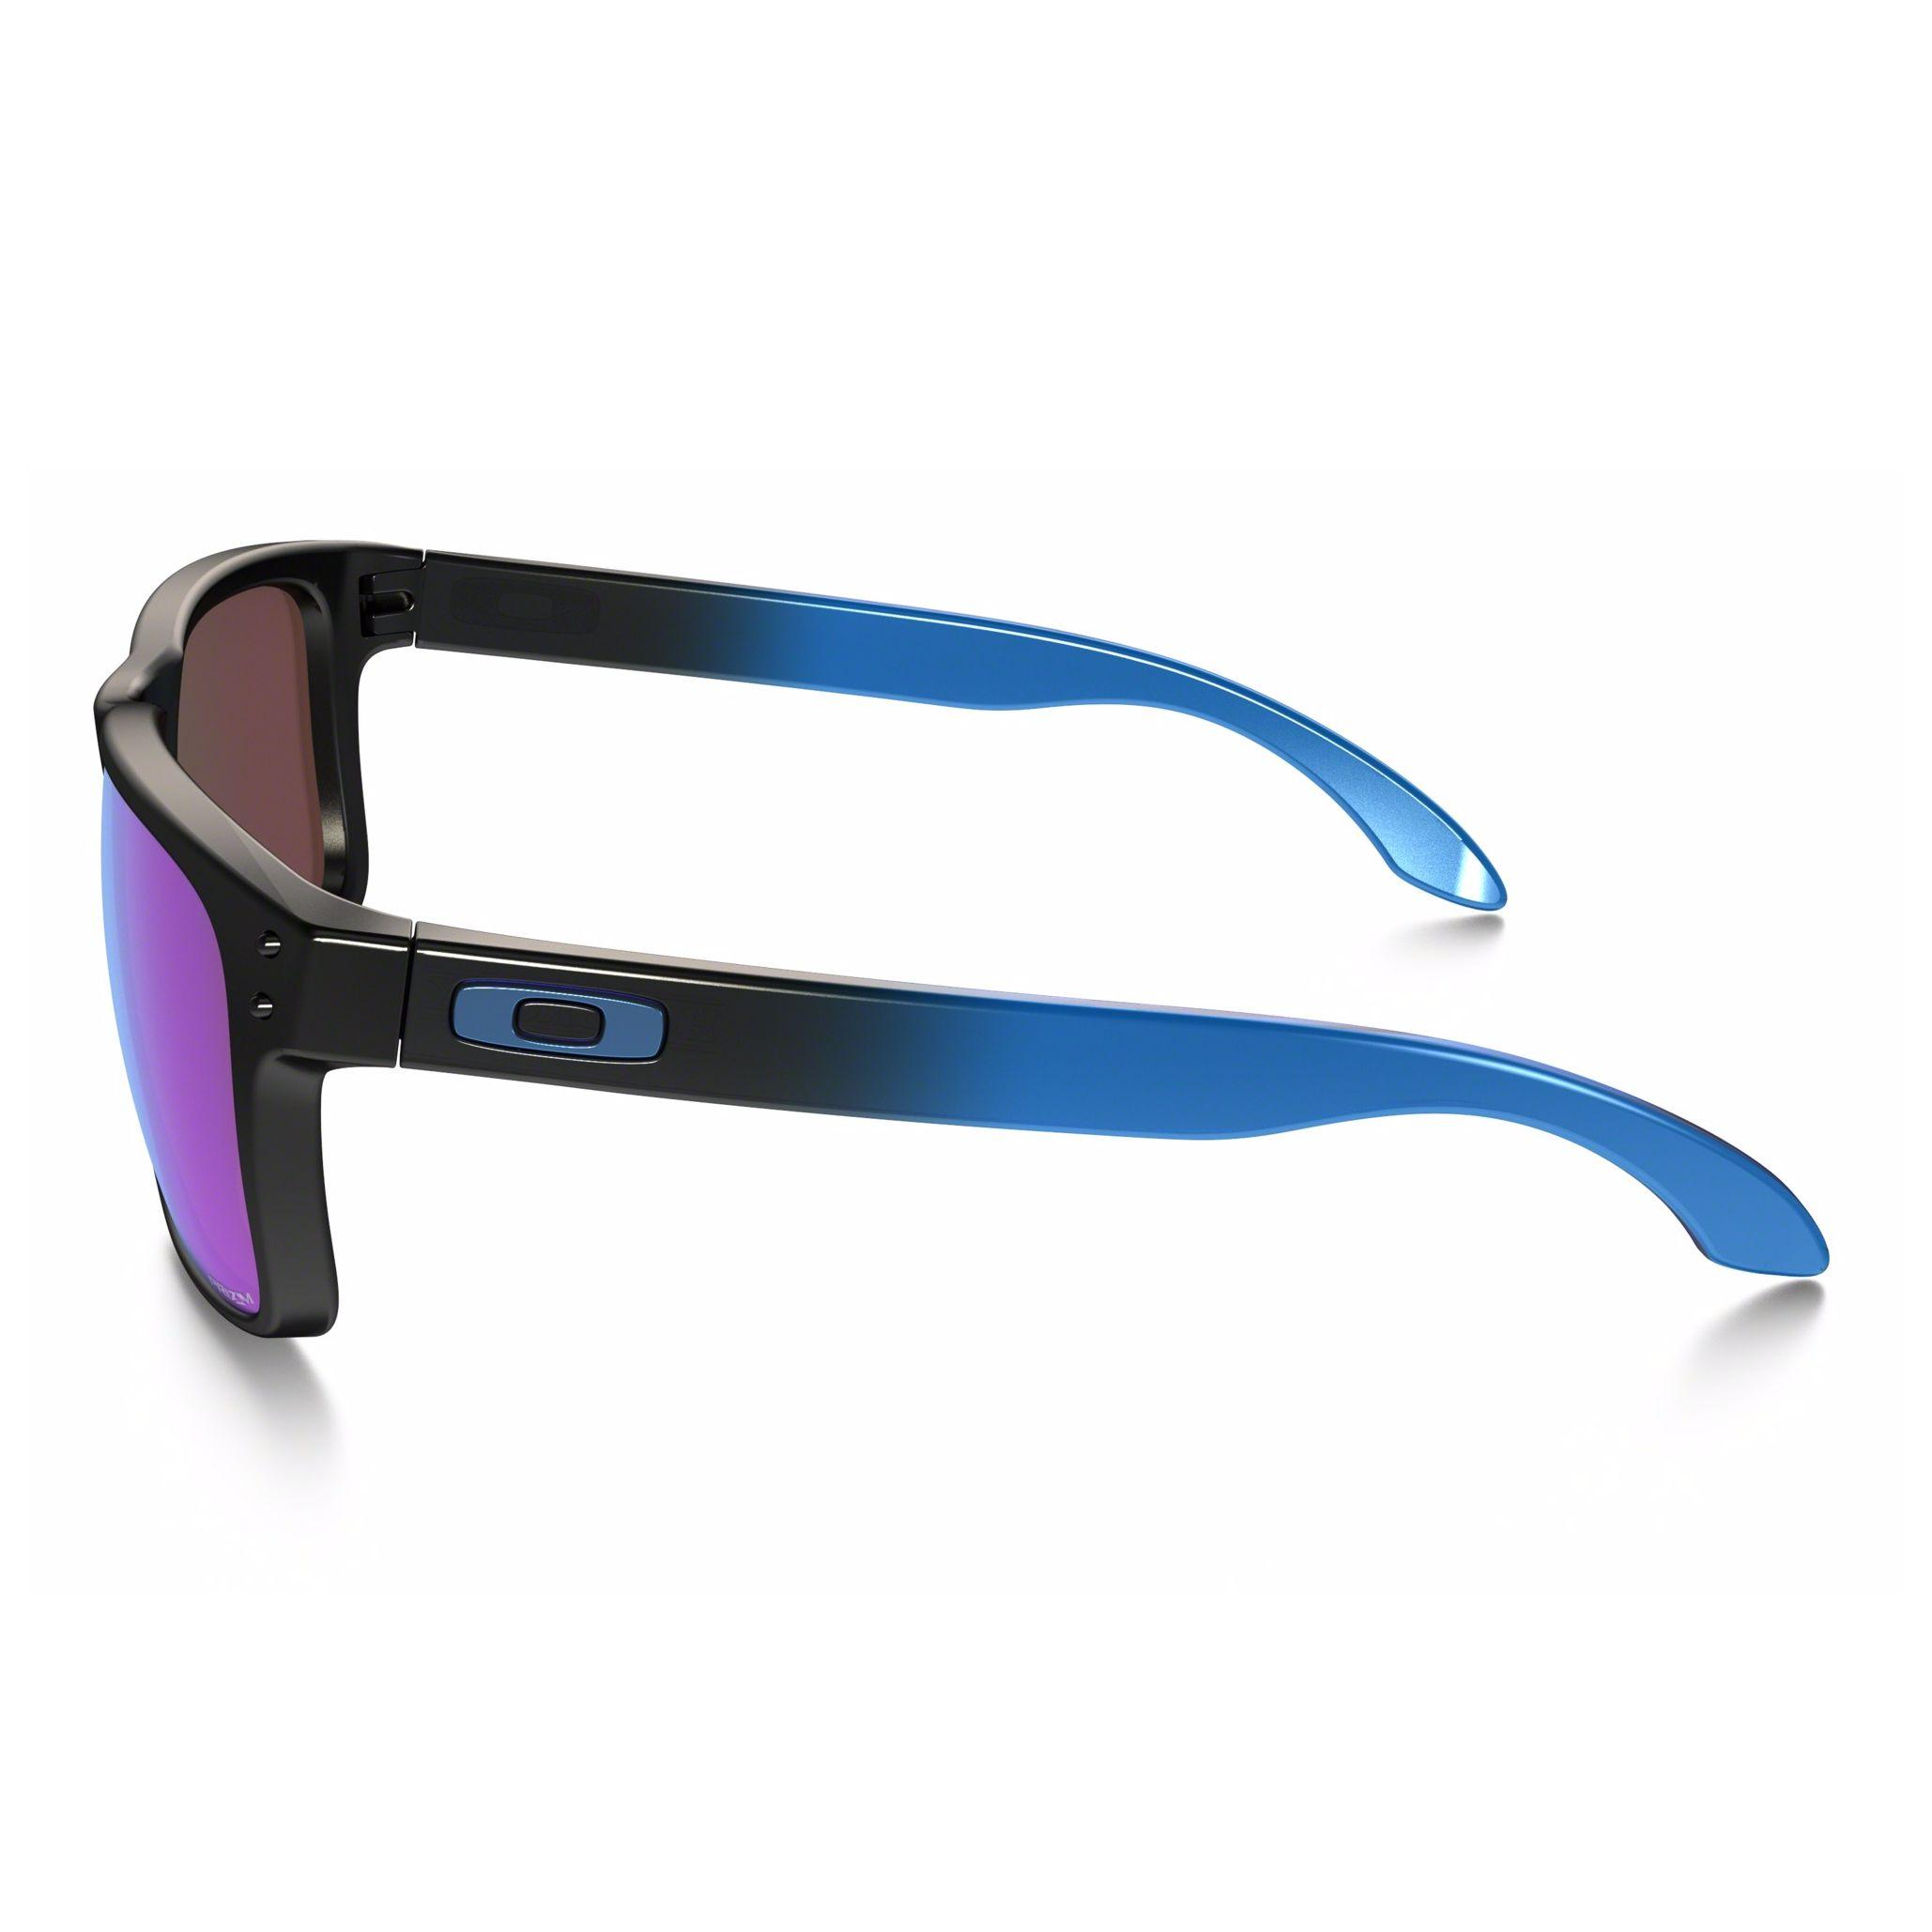 b9dfff0884 Gafas de sol Oakley HOLBROOK SAPHIR FADE COLLECTION - cristal polarizado  prizm